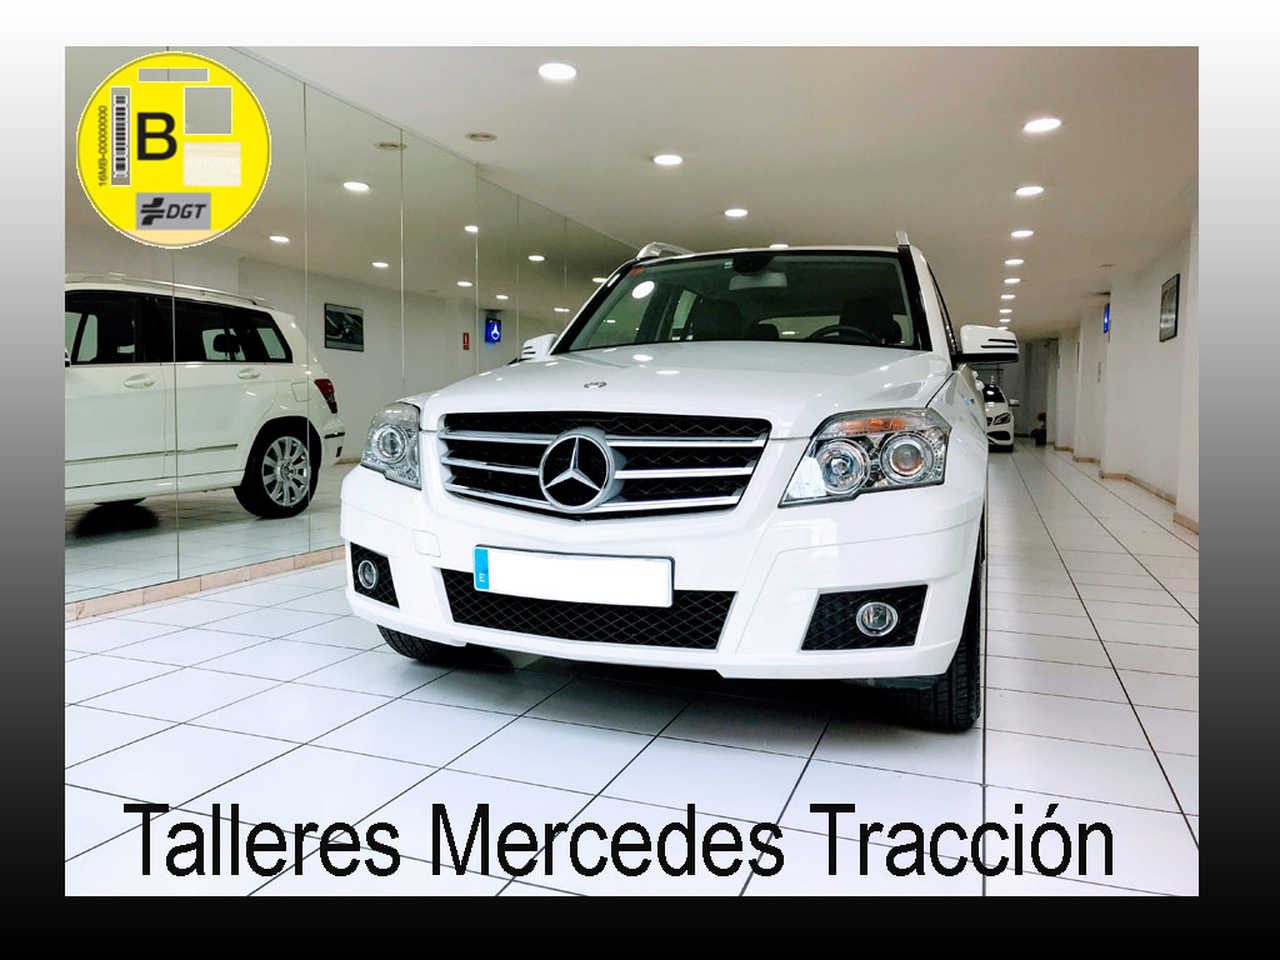 Mercedes Clase GLK 220 CDI BE 4 Matic/Paquete deportivo interior/exterior   - Foto 1